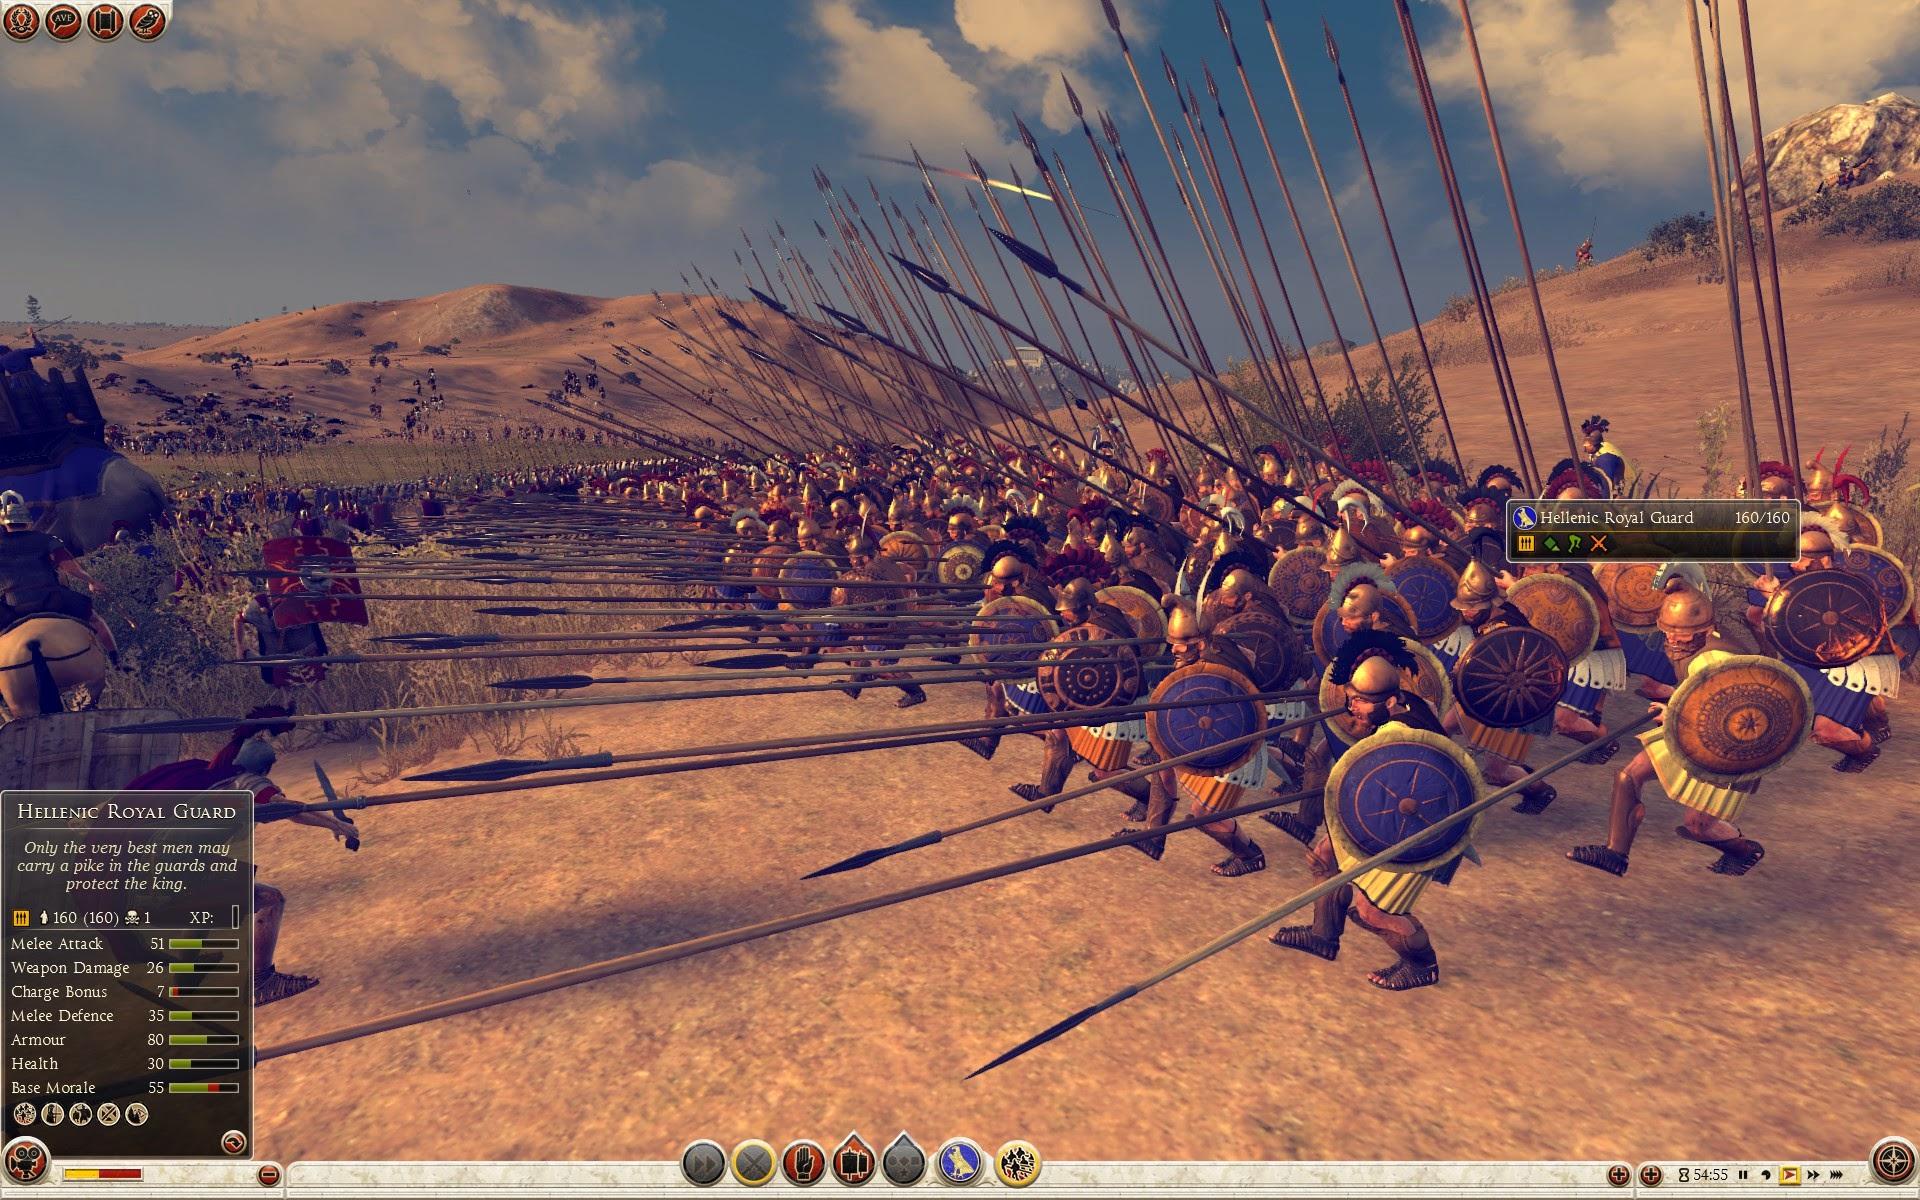 Hellenic Royal Guard - Epirus - Total War: Rome II - Royal Military